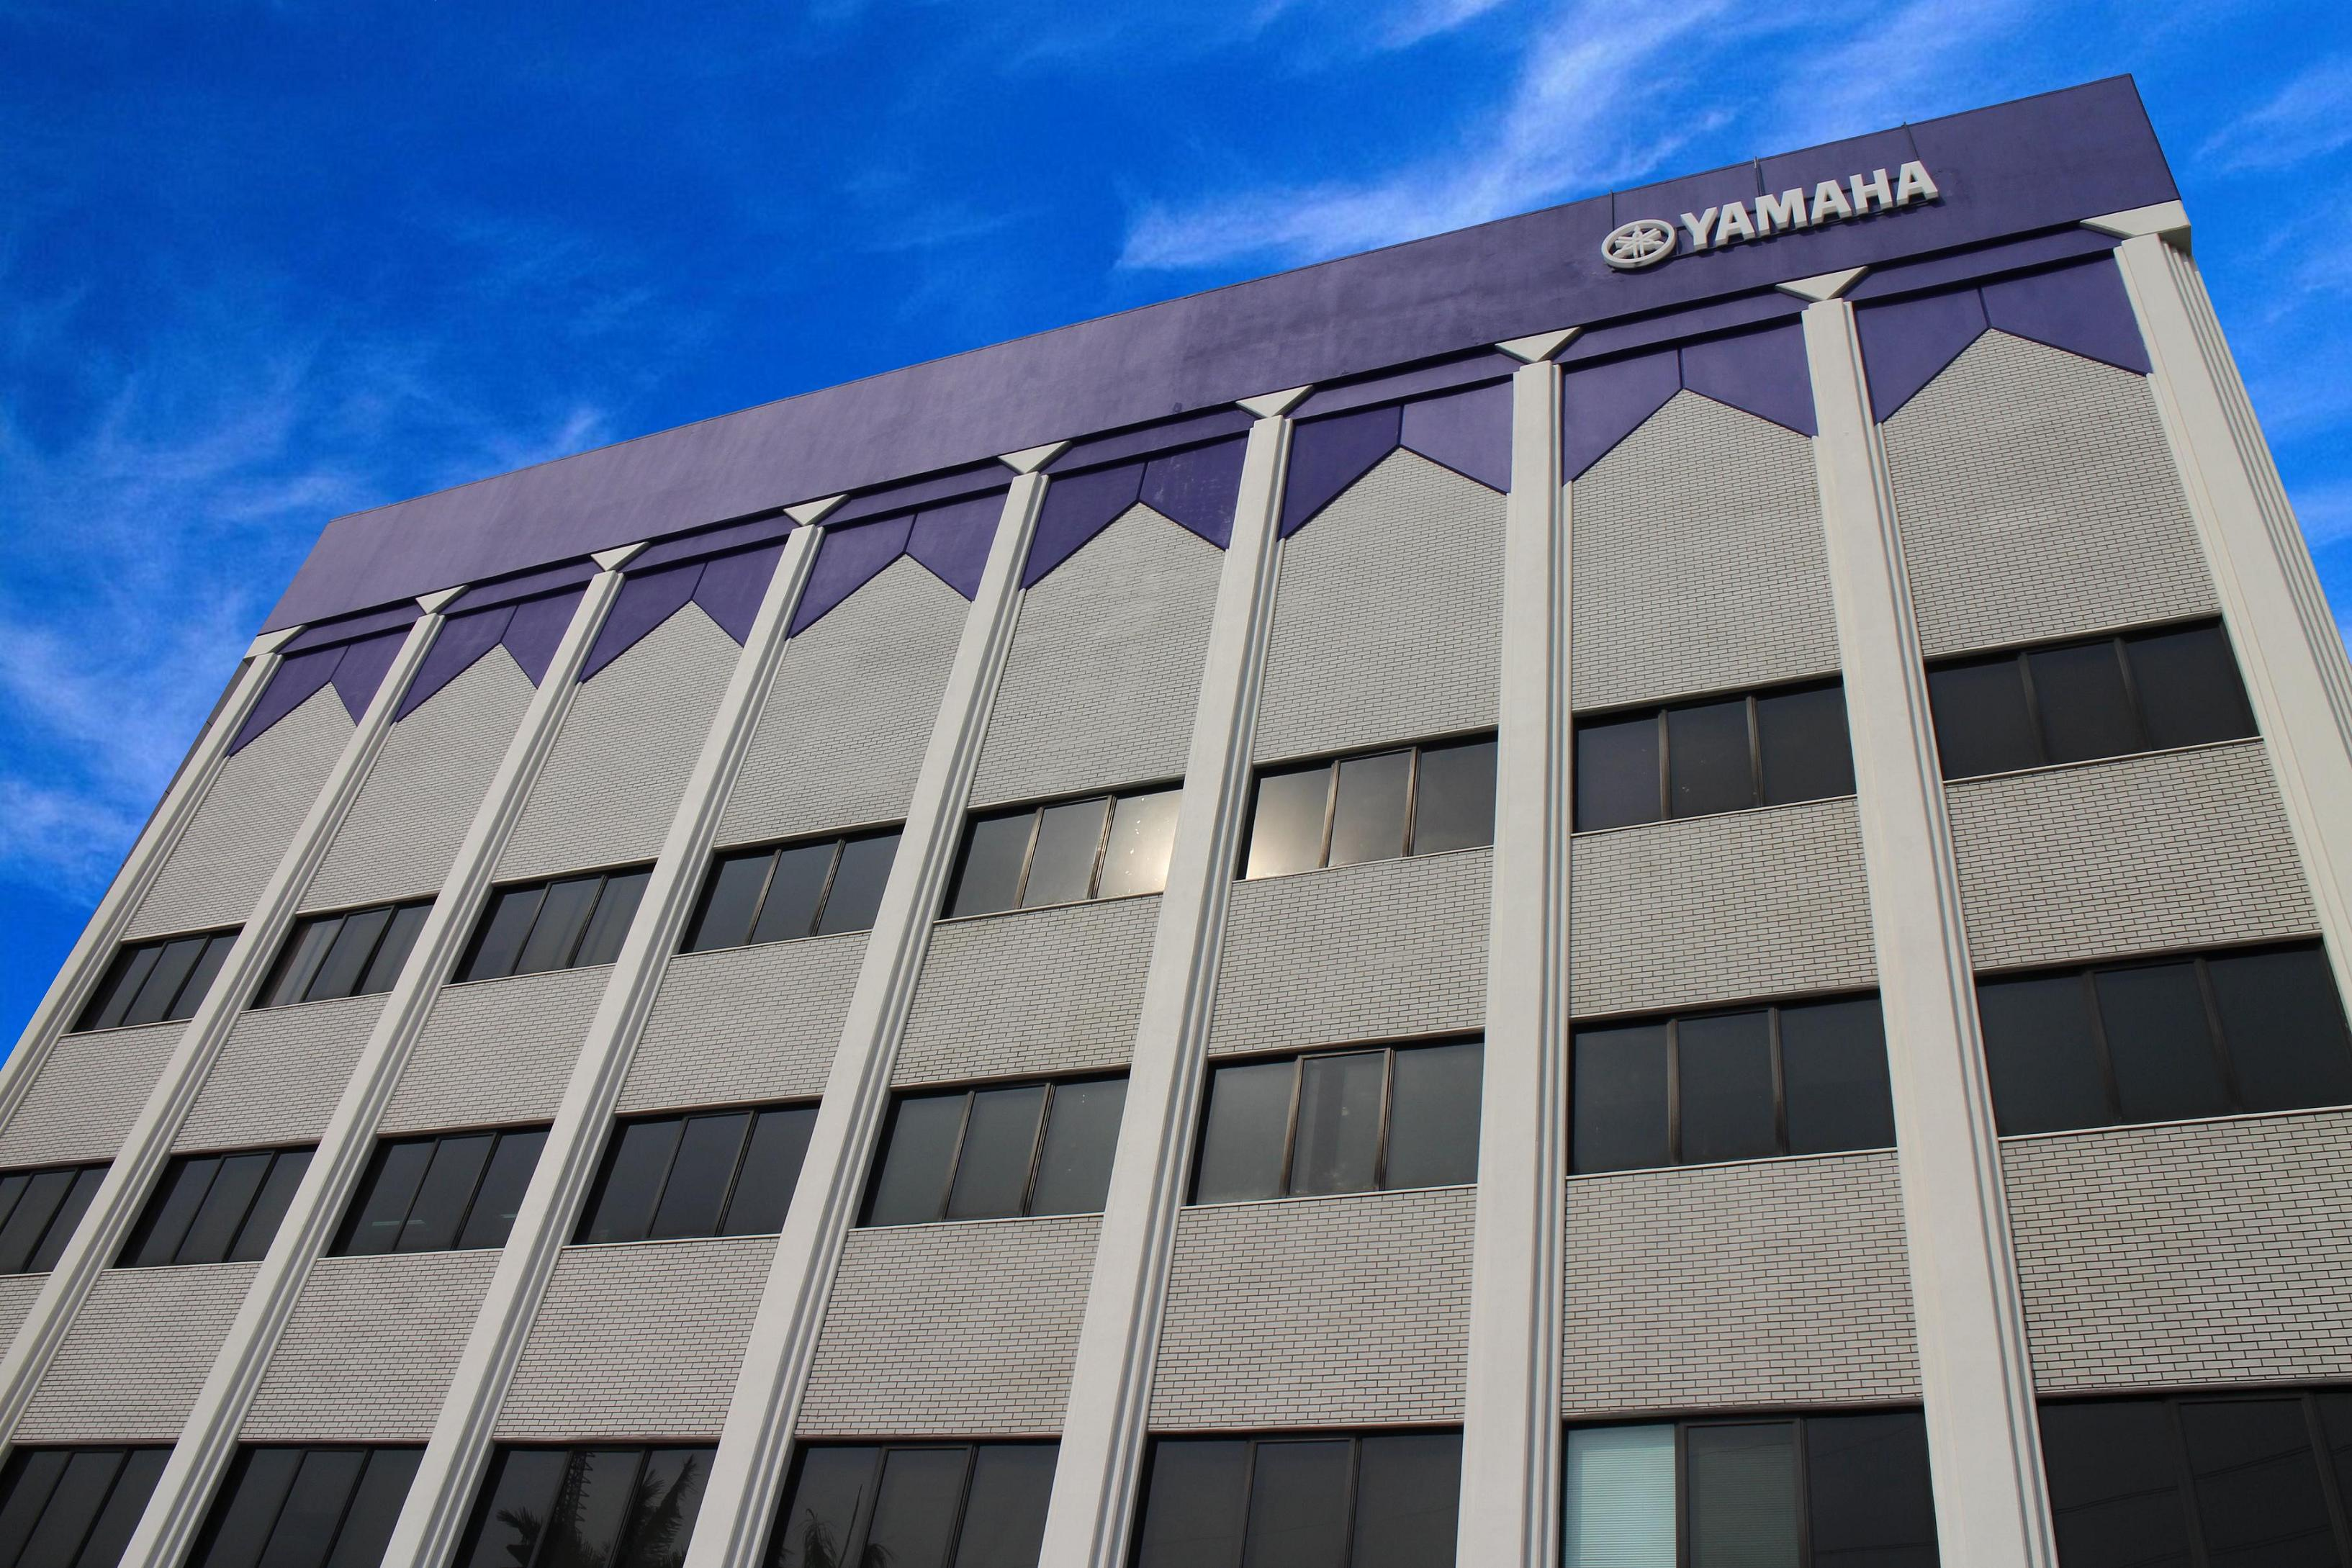 Yamaha music indonesia office indonesia for Yamaha headquarters usa